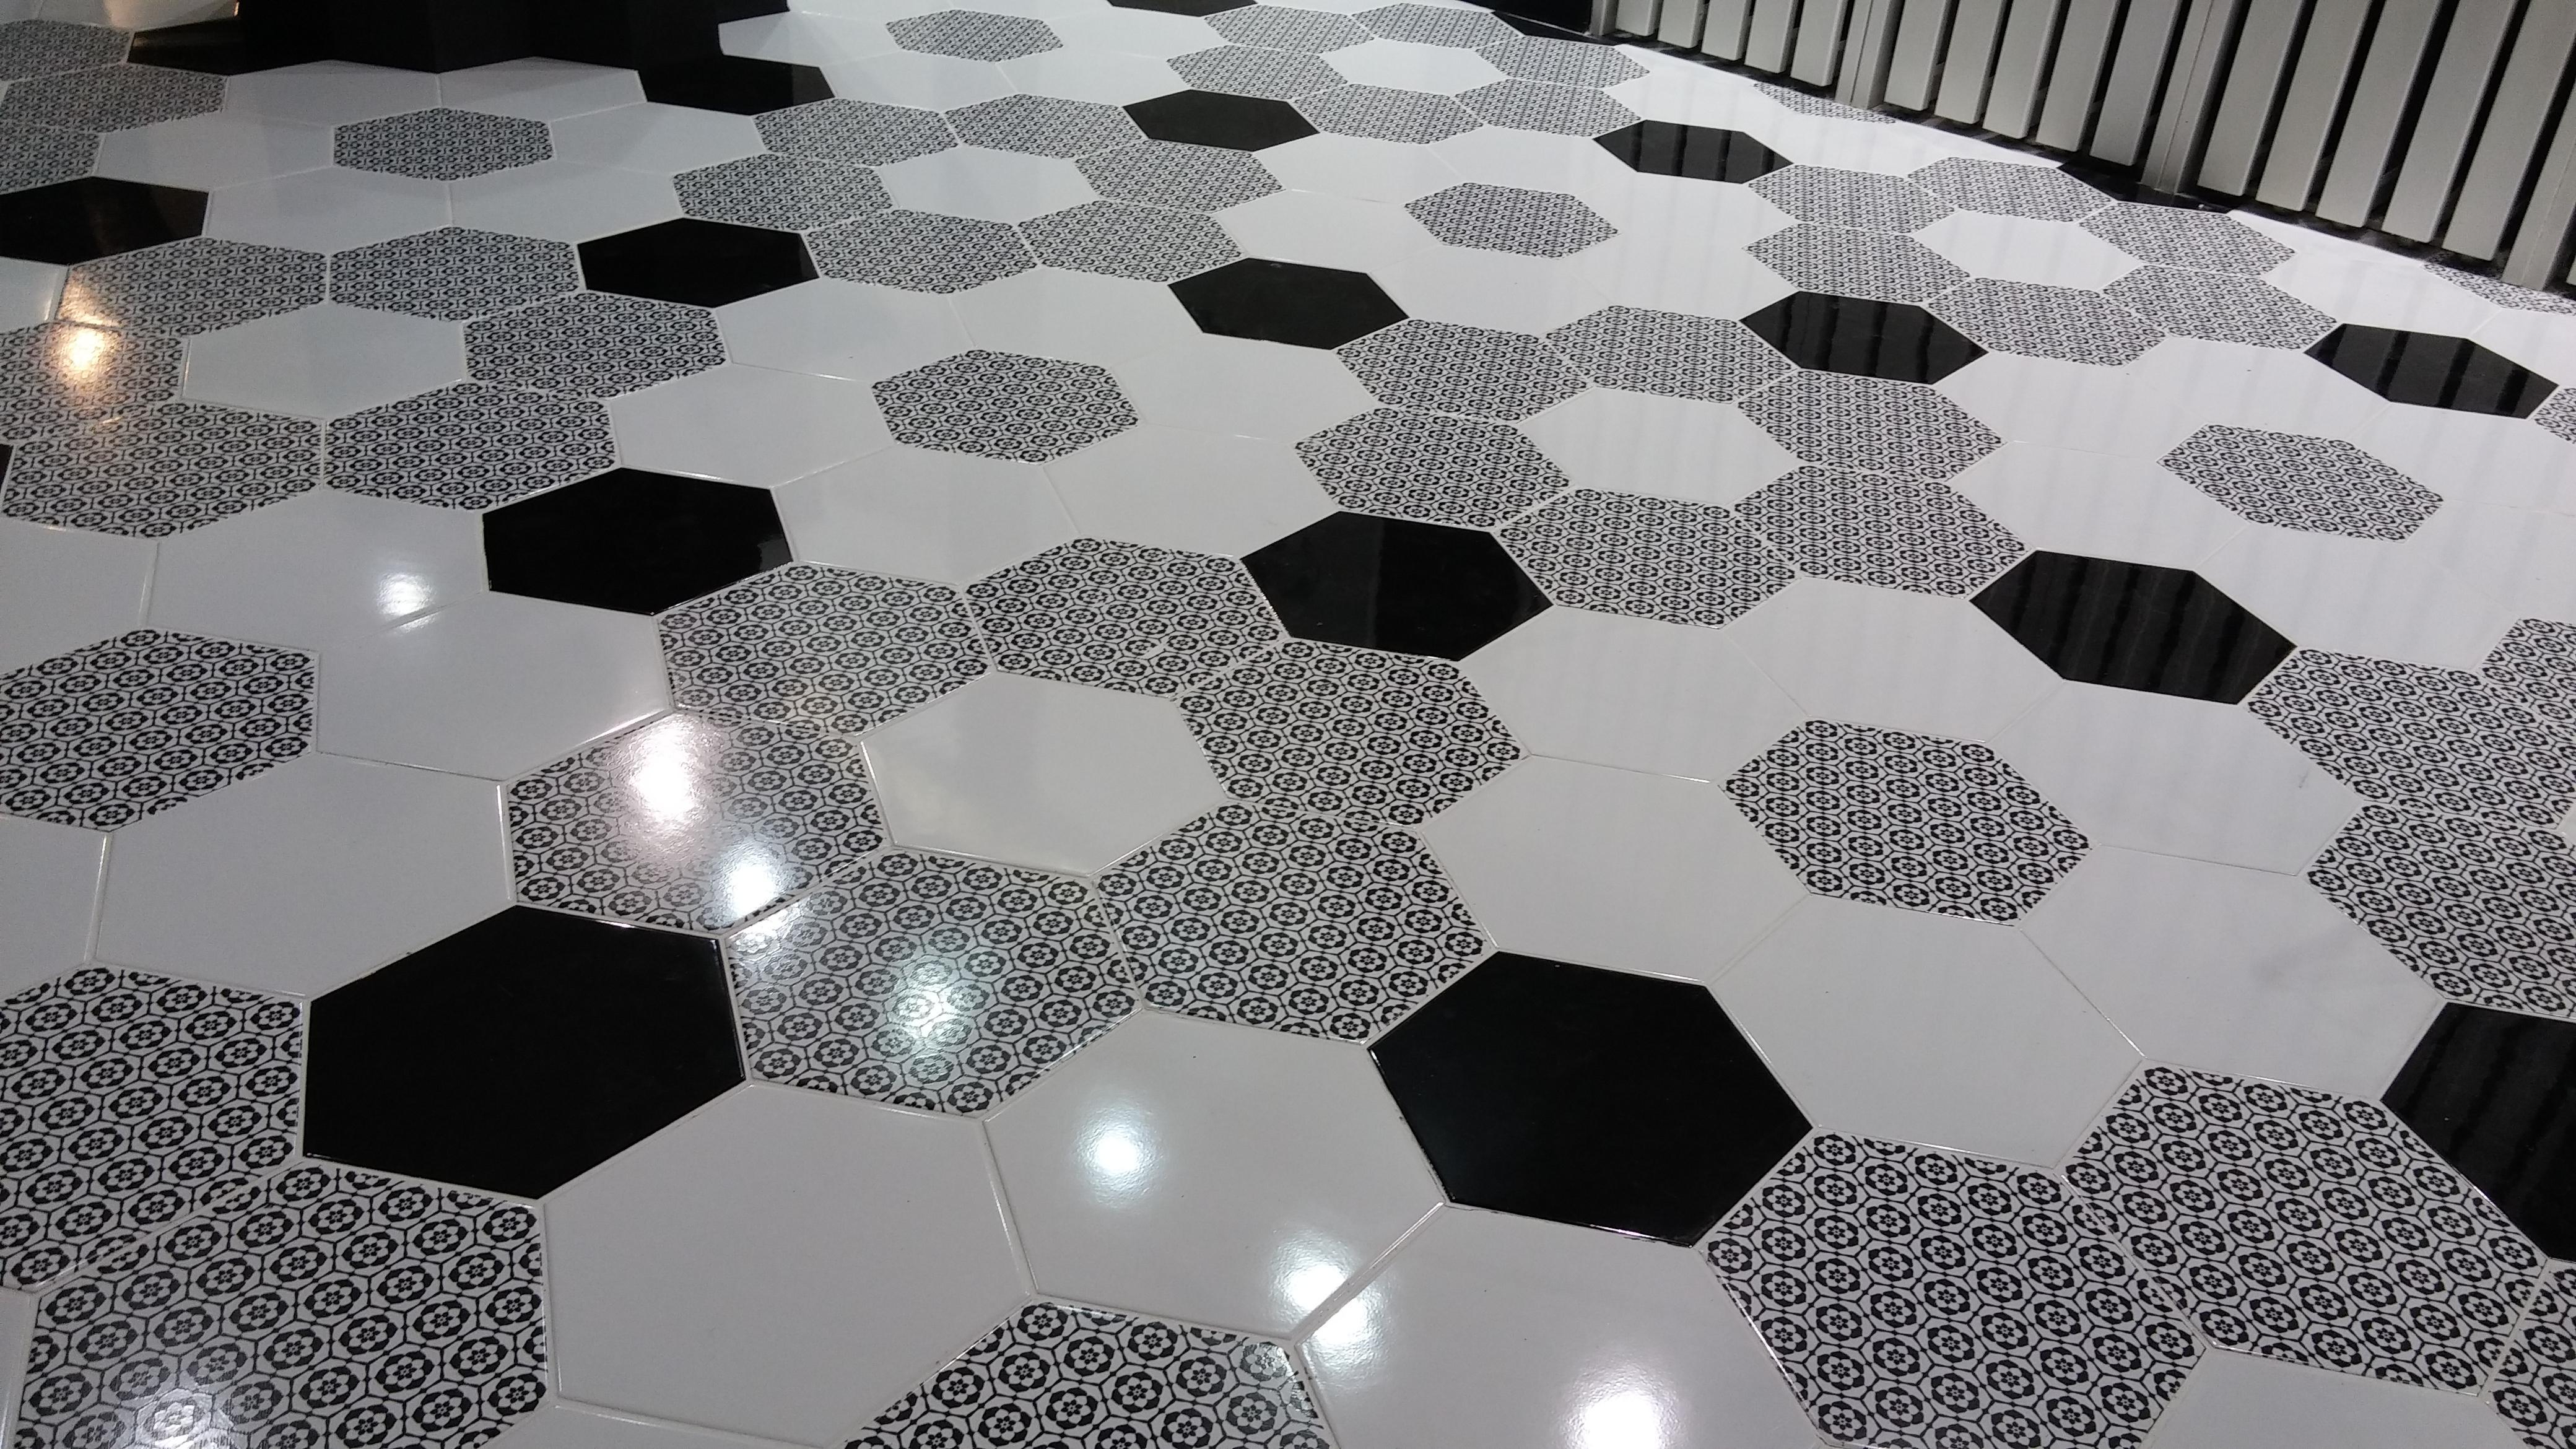 Novedades azulejo hexagonal tino jornet - Azulejos hexagonales ...